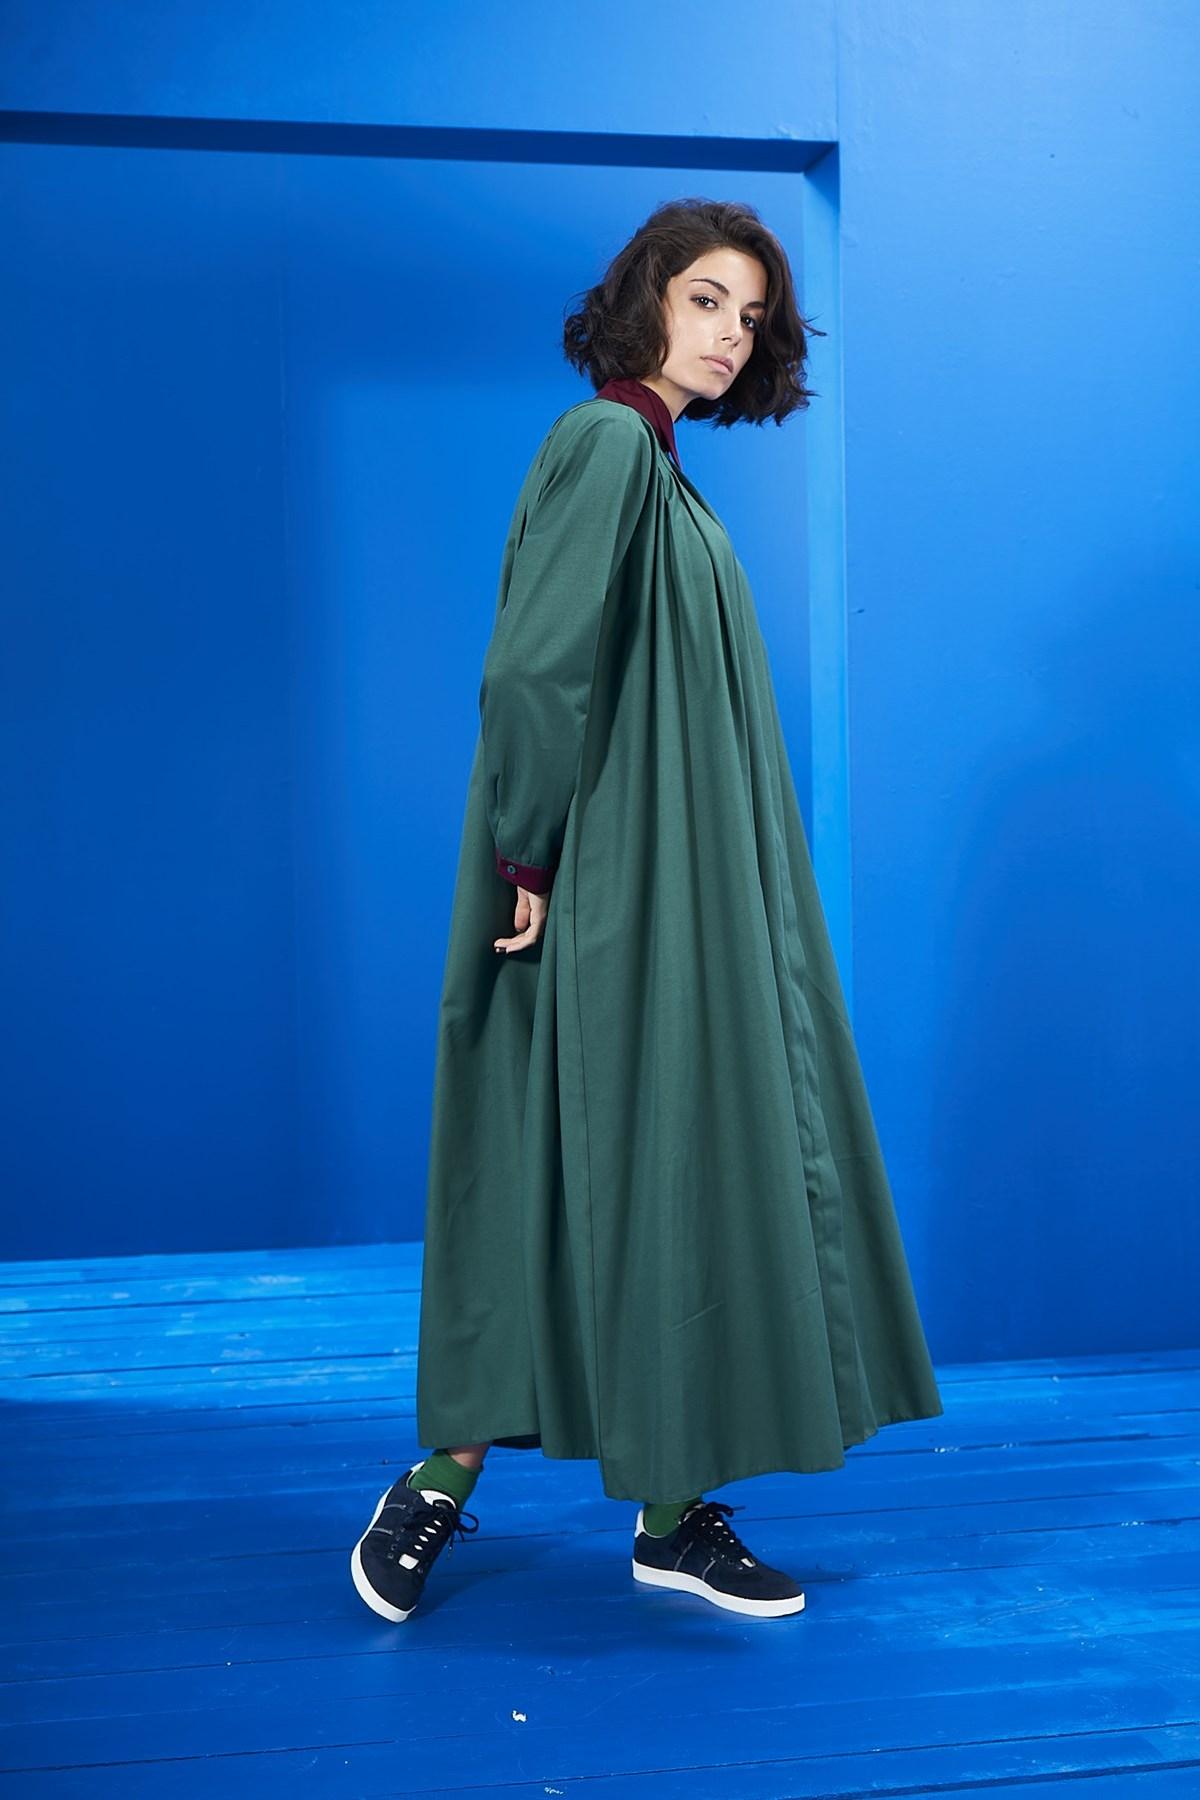 Mevra - Yaka Detay Elbise Yeşil-Bordo